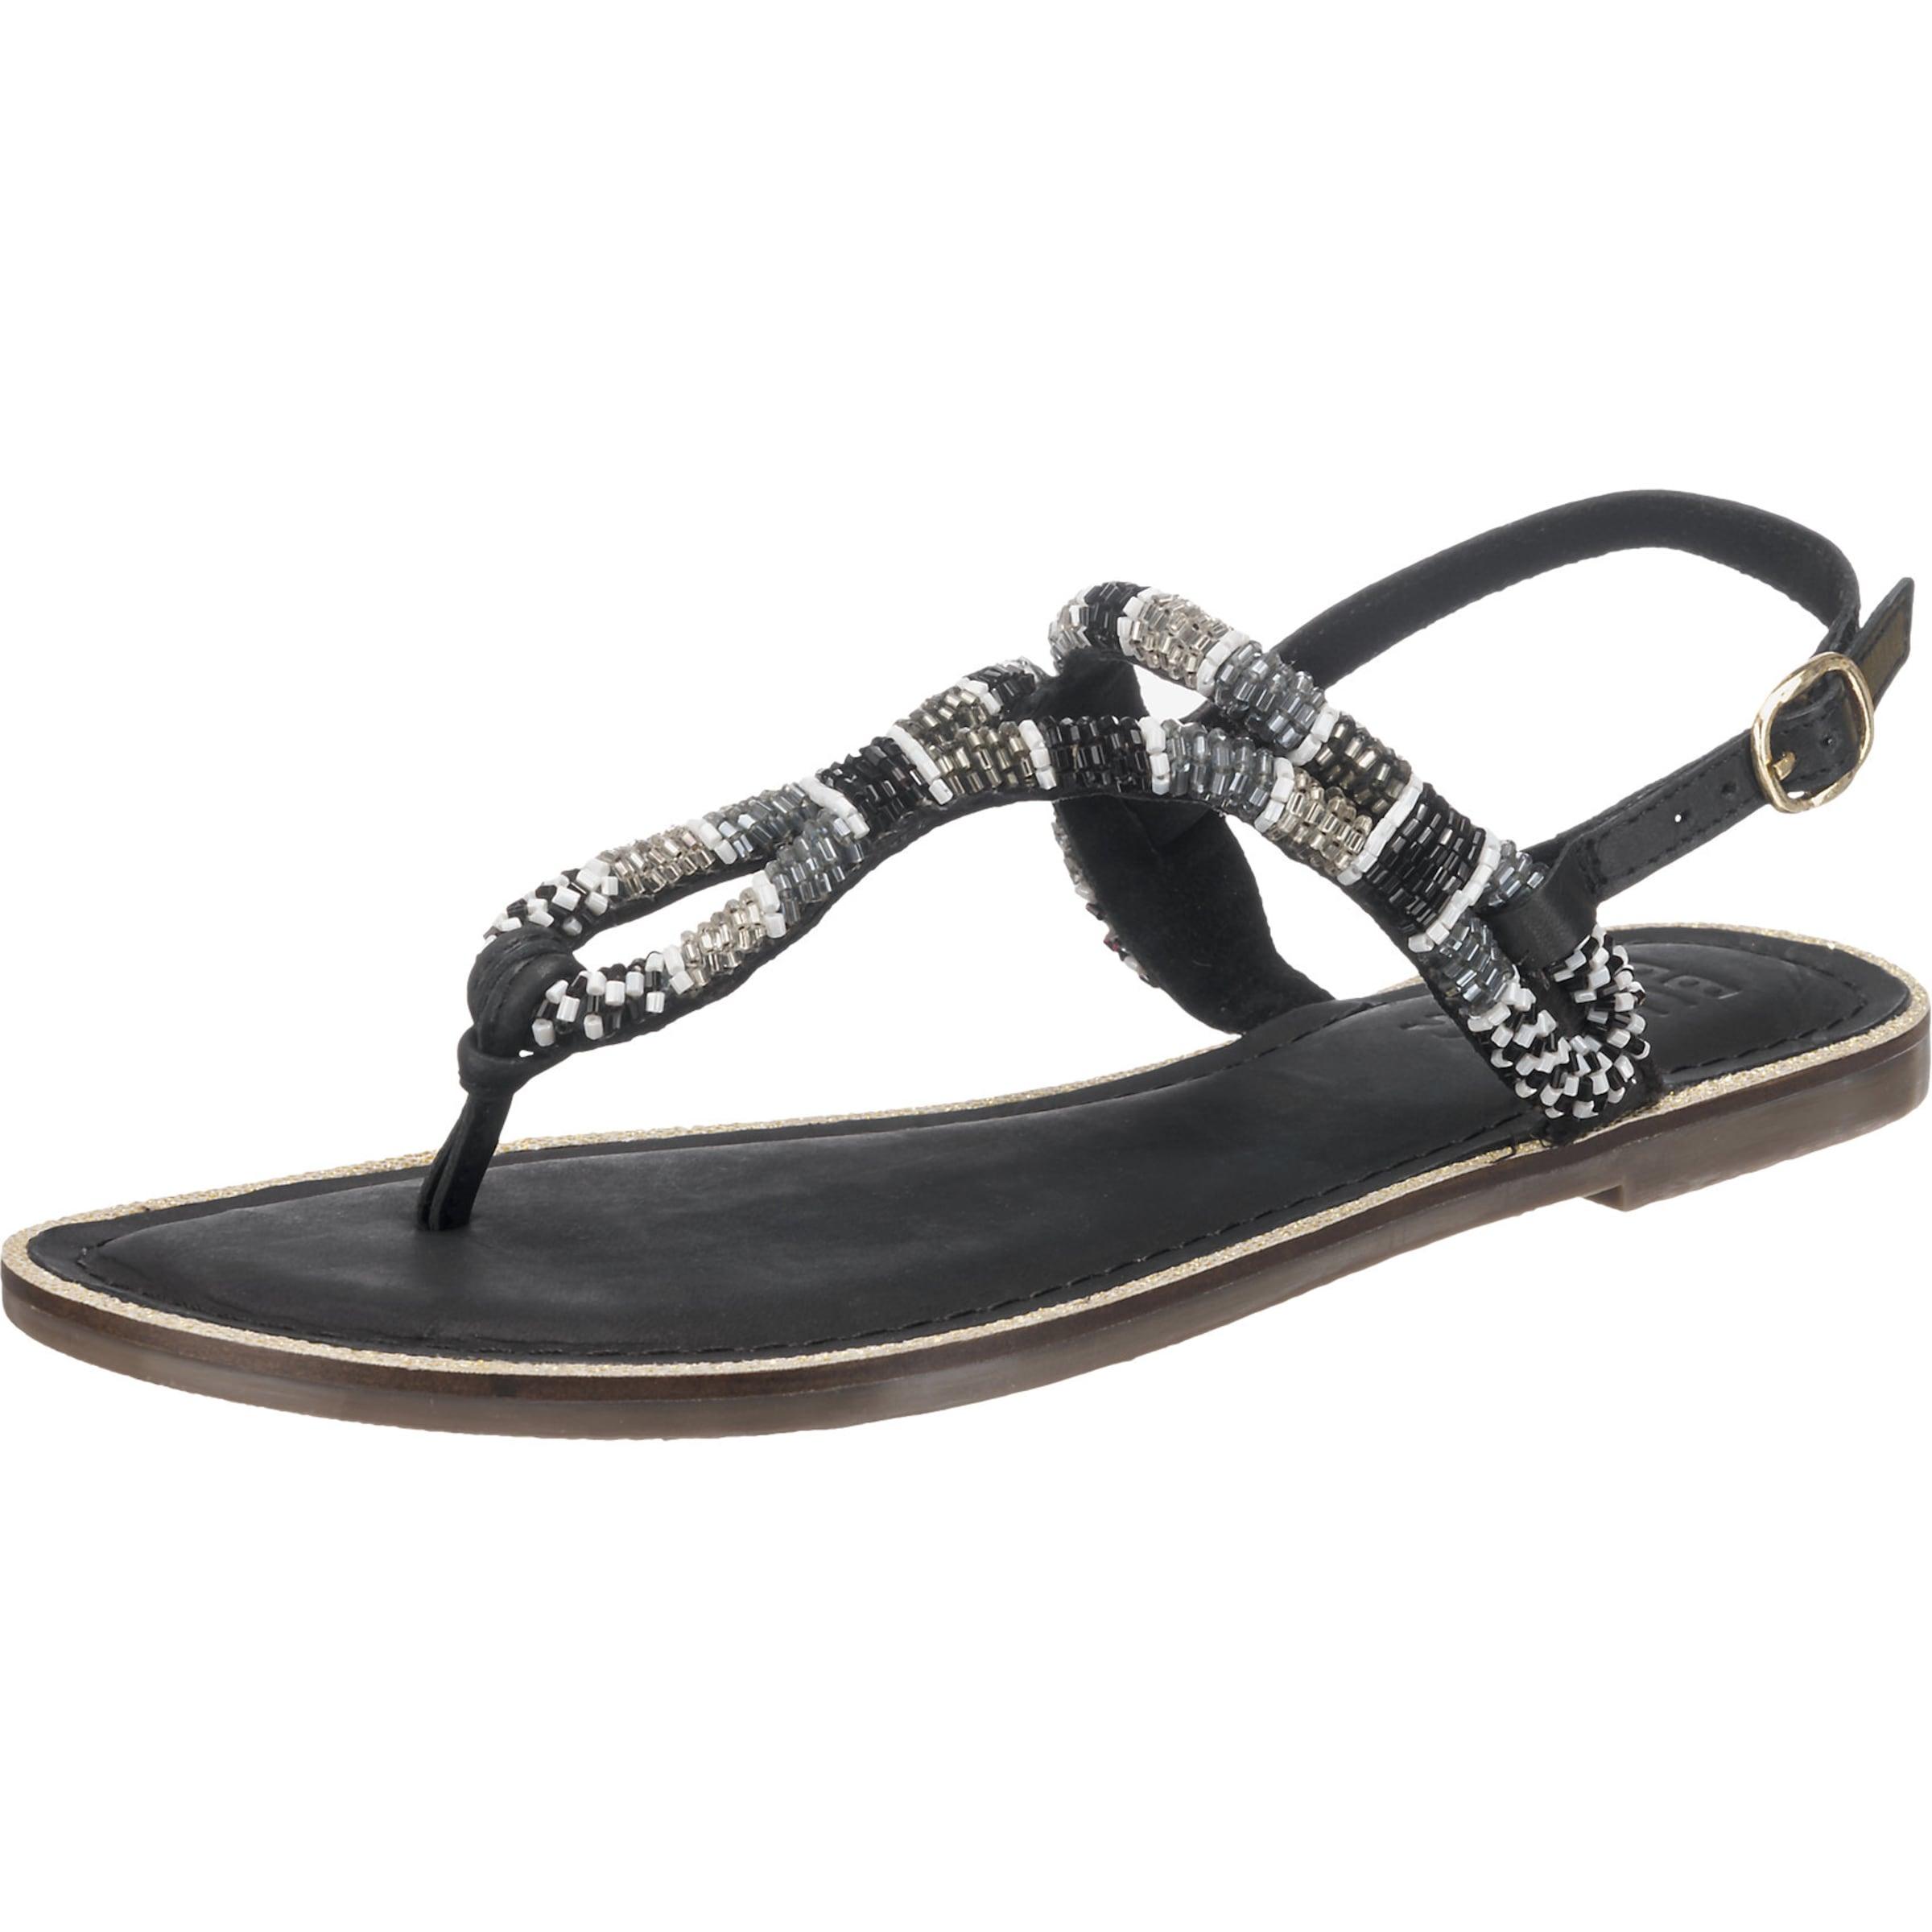 BULLBOXER Sandaletten Größte Anbieter s6O632bZa